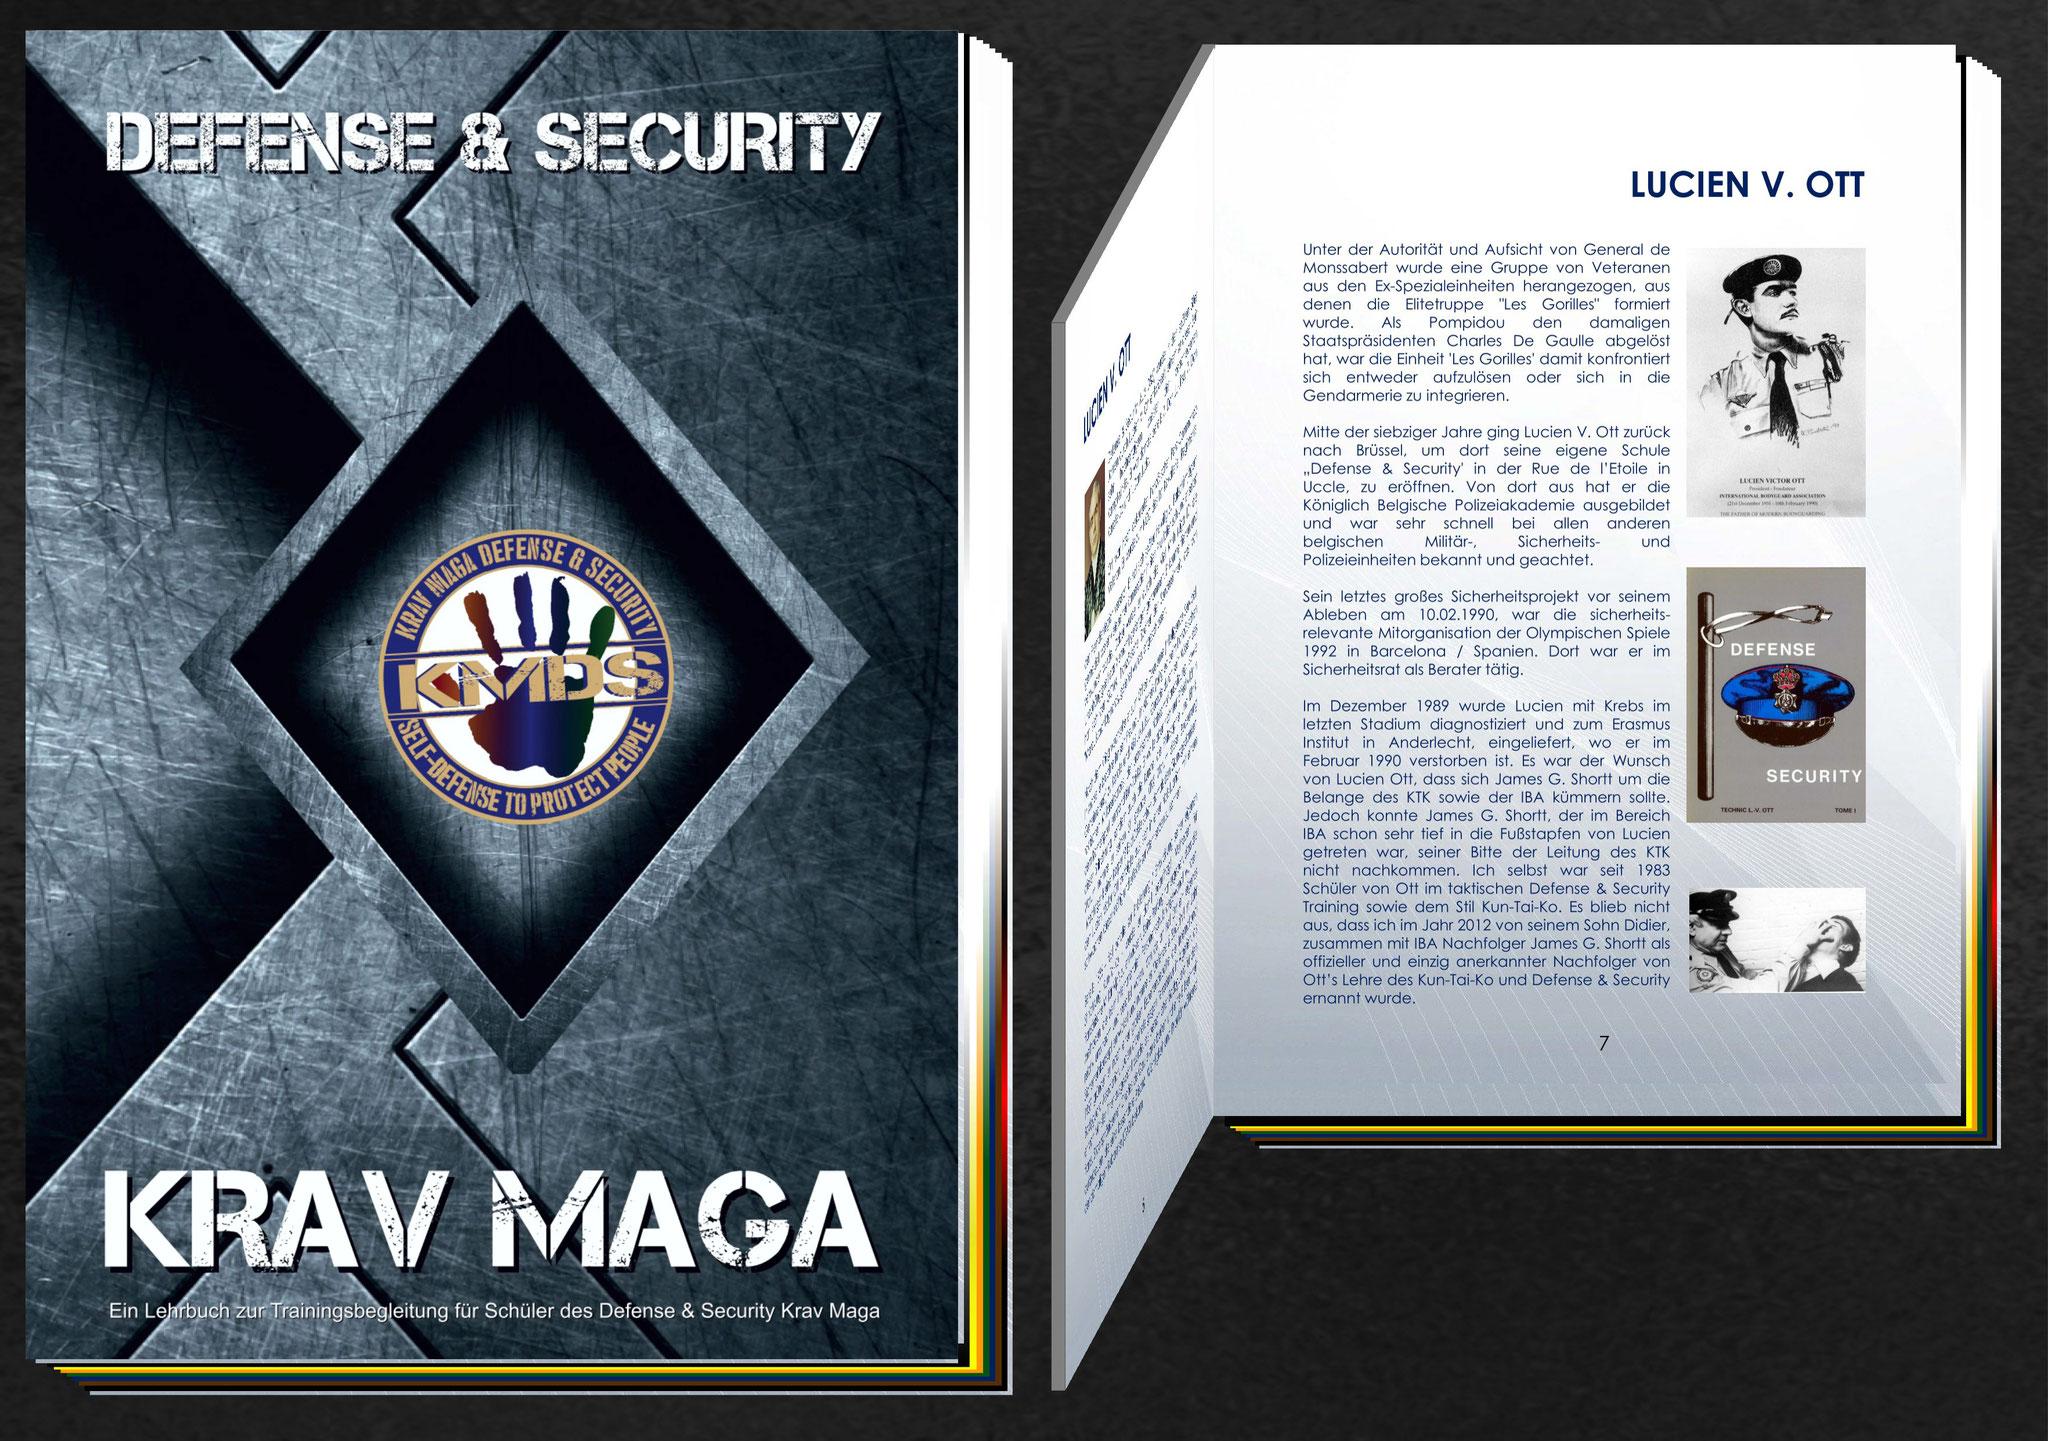 KMDS - Krav Maga Defense & Security Lehrbuch